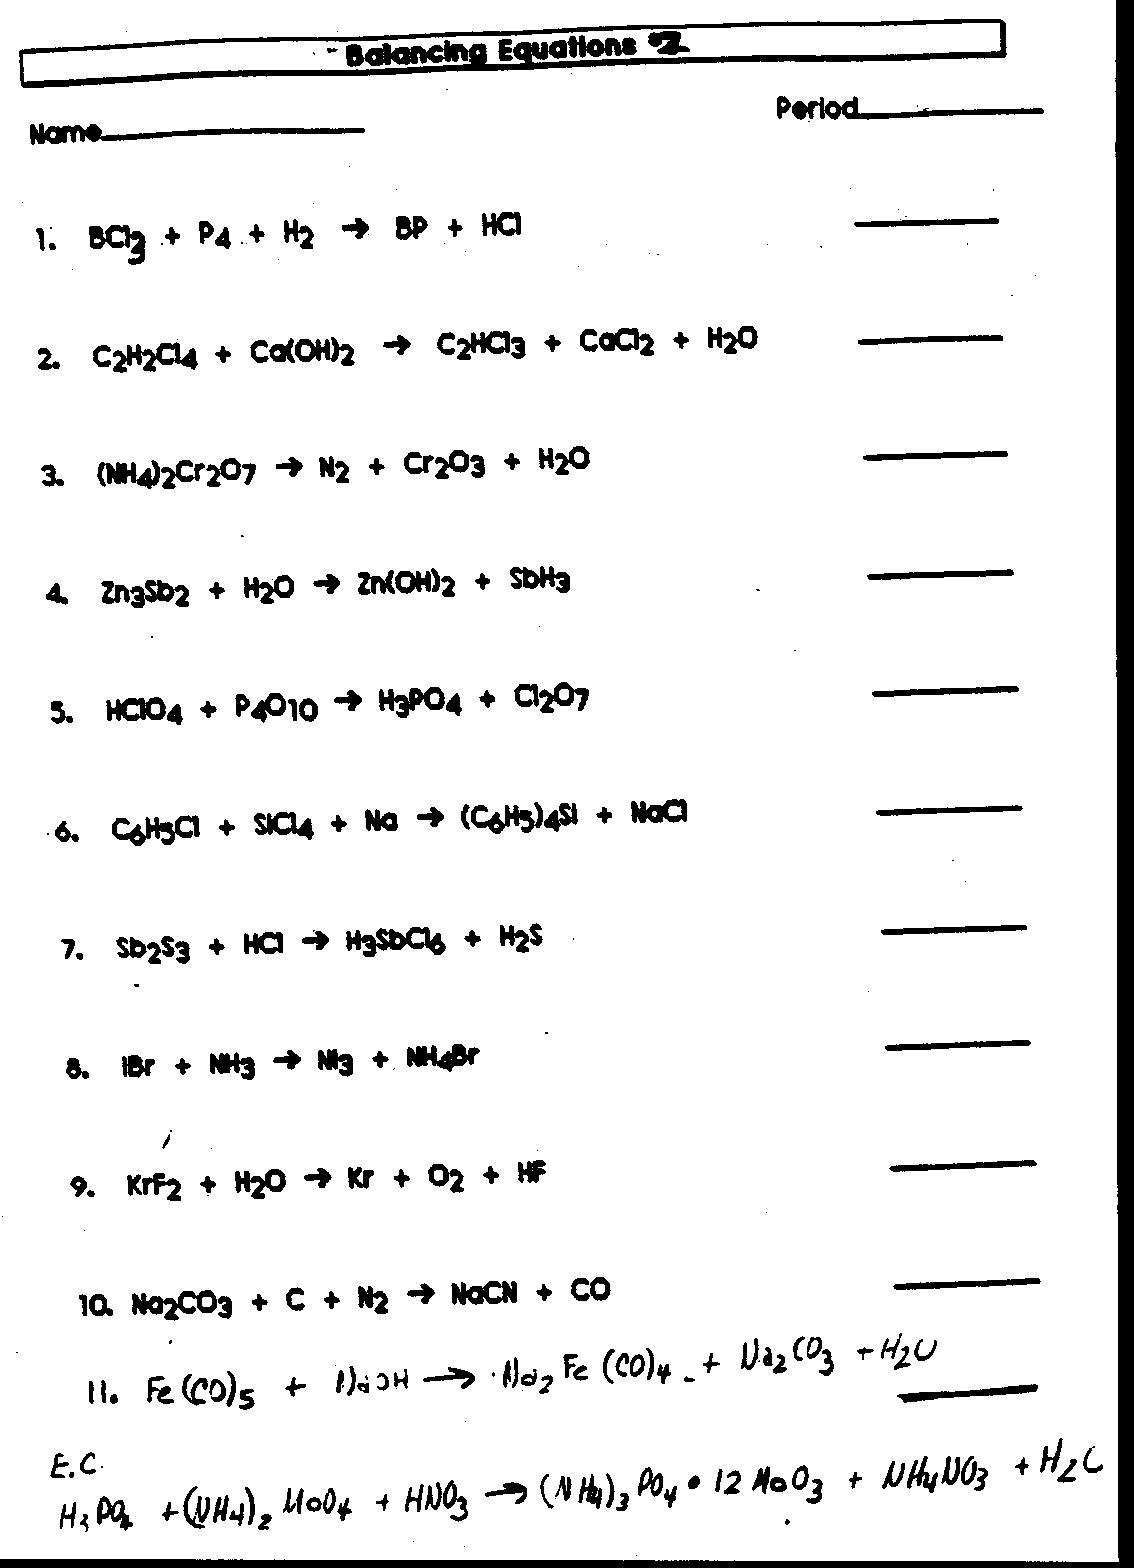 Word Equation Worksheet Chemistry Pichaglobal, Writing Equations